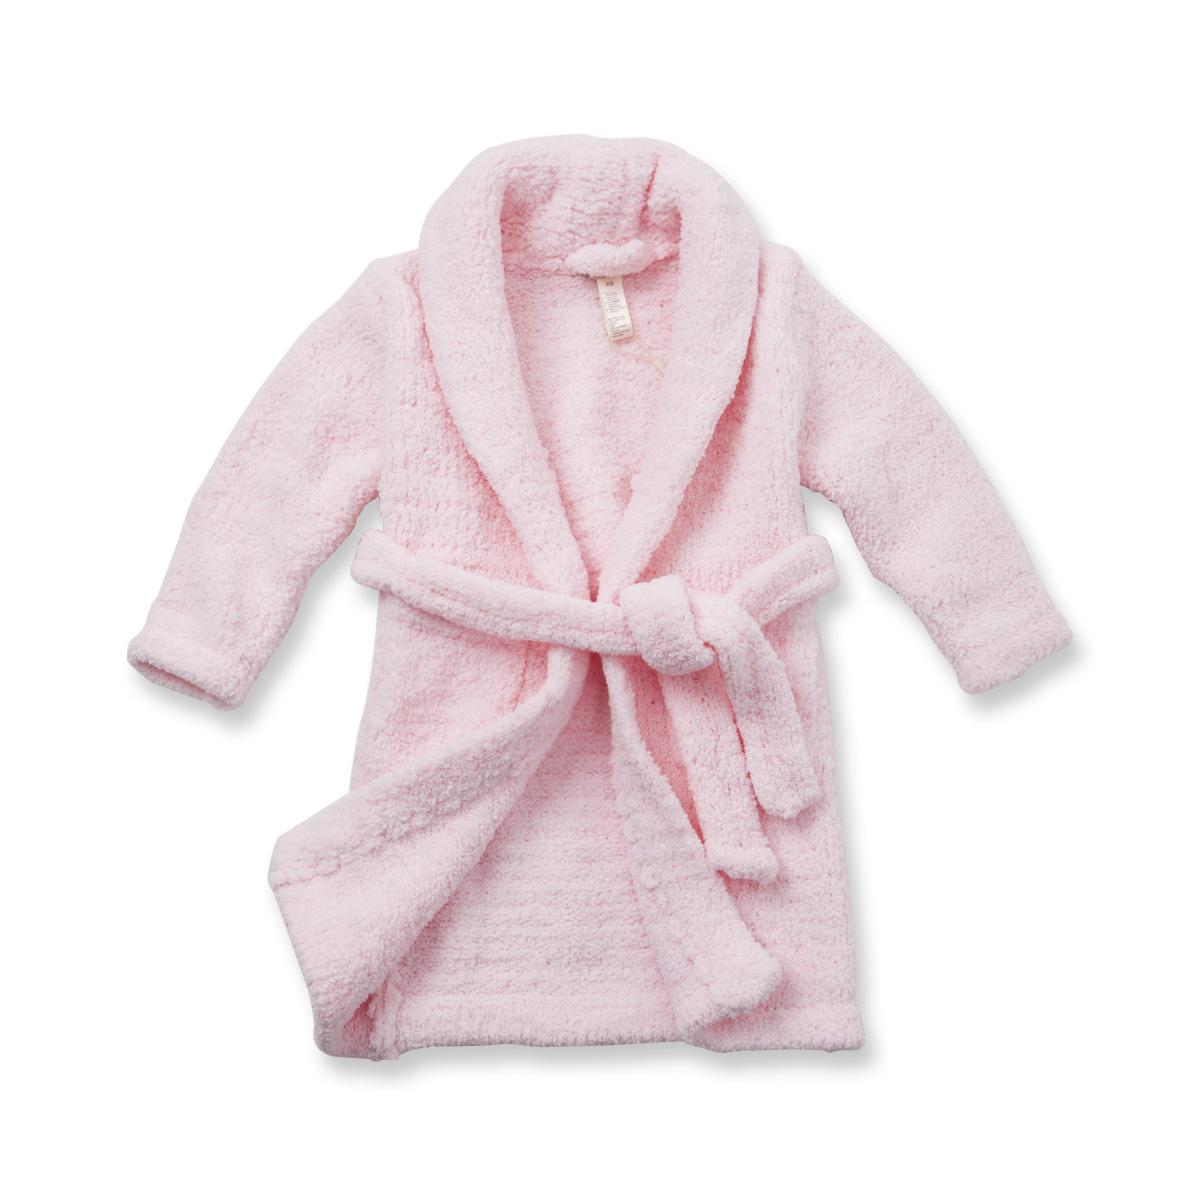 Davebella 2012 autumn and winter ultra soft chenille baby thermal sleepwear robe baby sleepwear 138